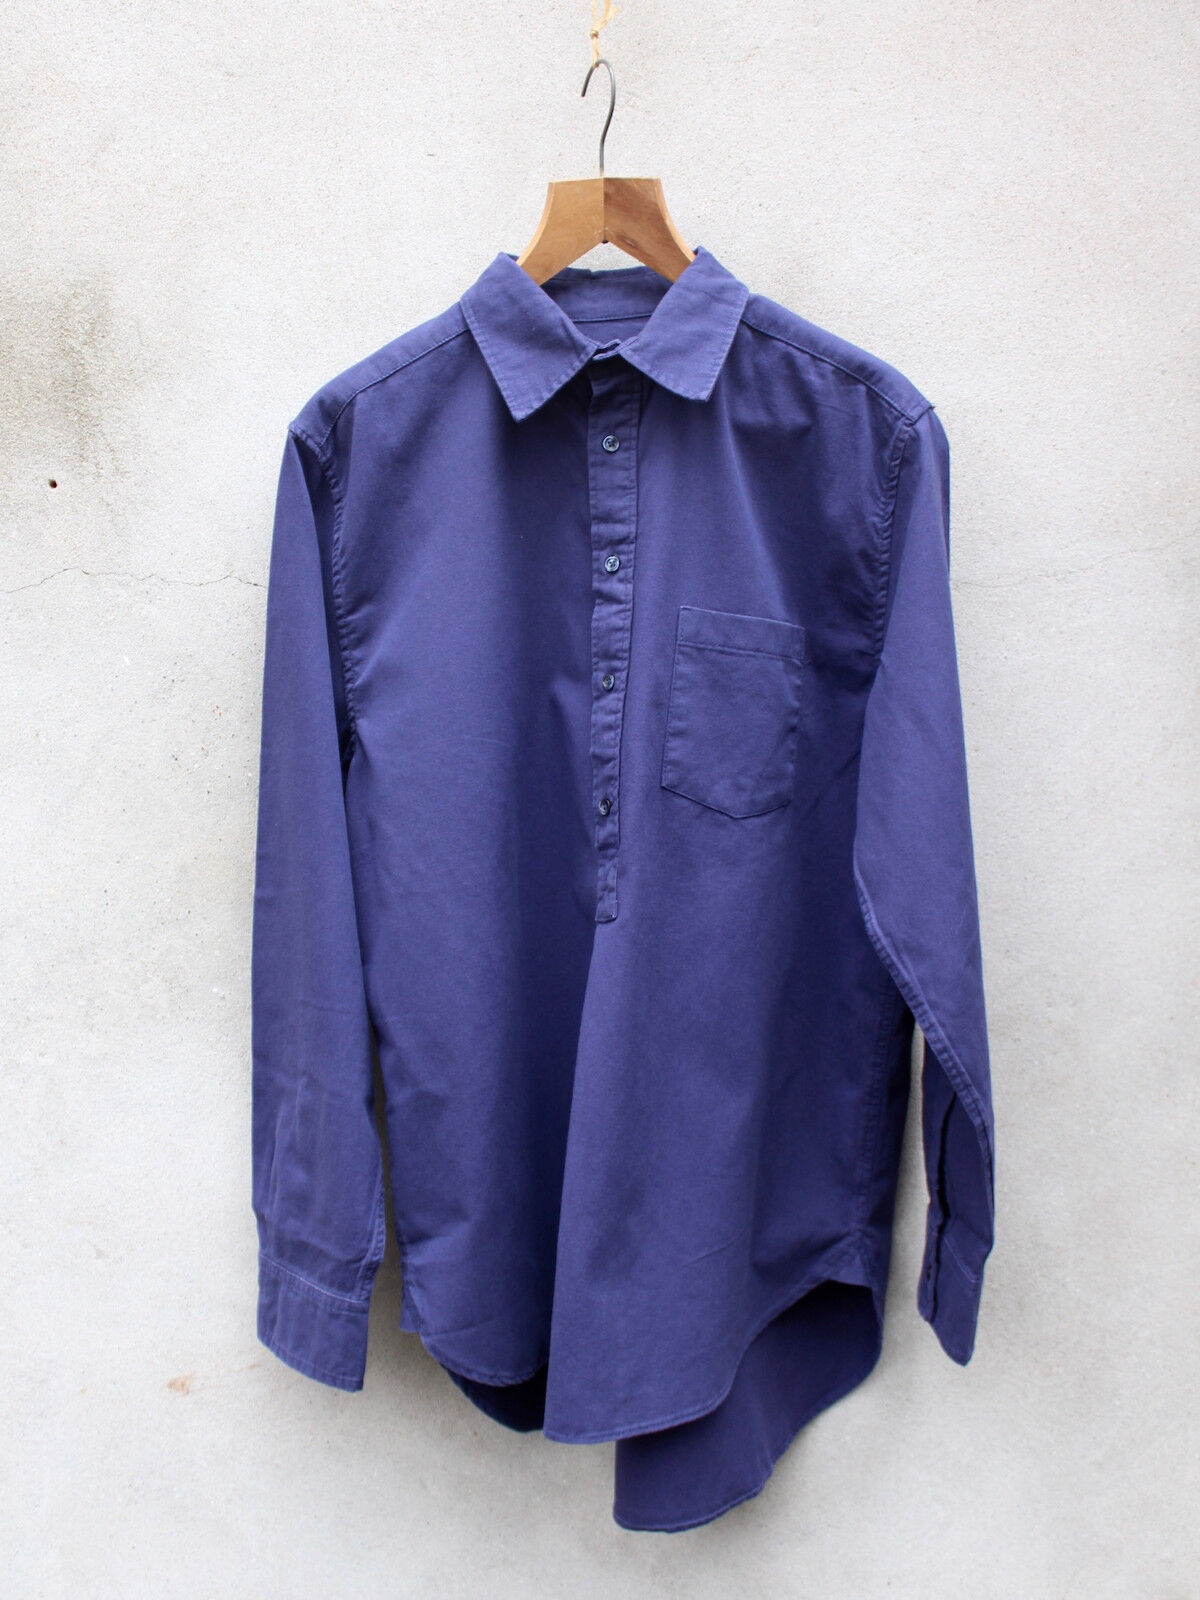 Soft Dark blu Work Shirt by Code, l'imprevisto – 100% cotone twill lavato